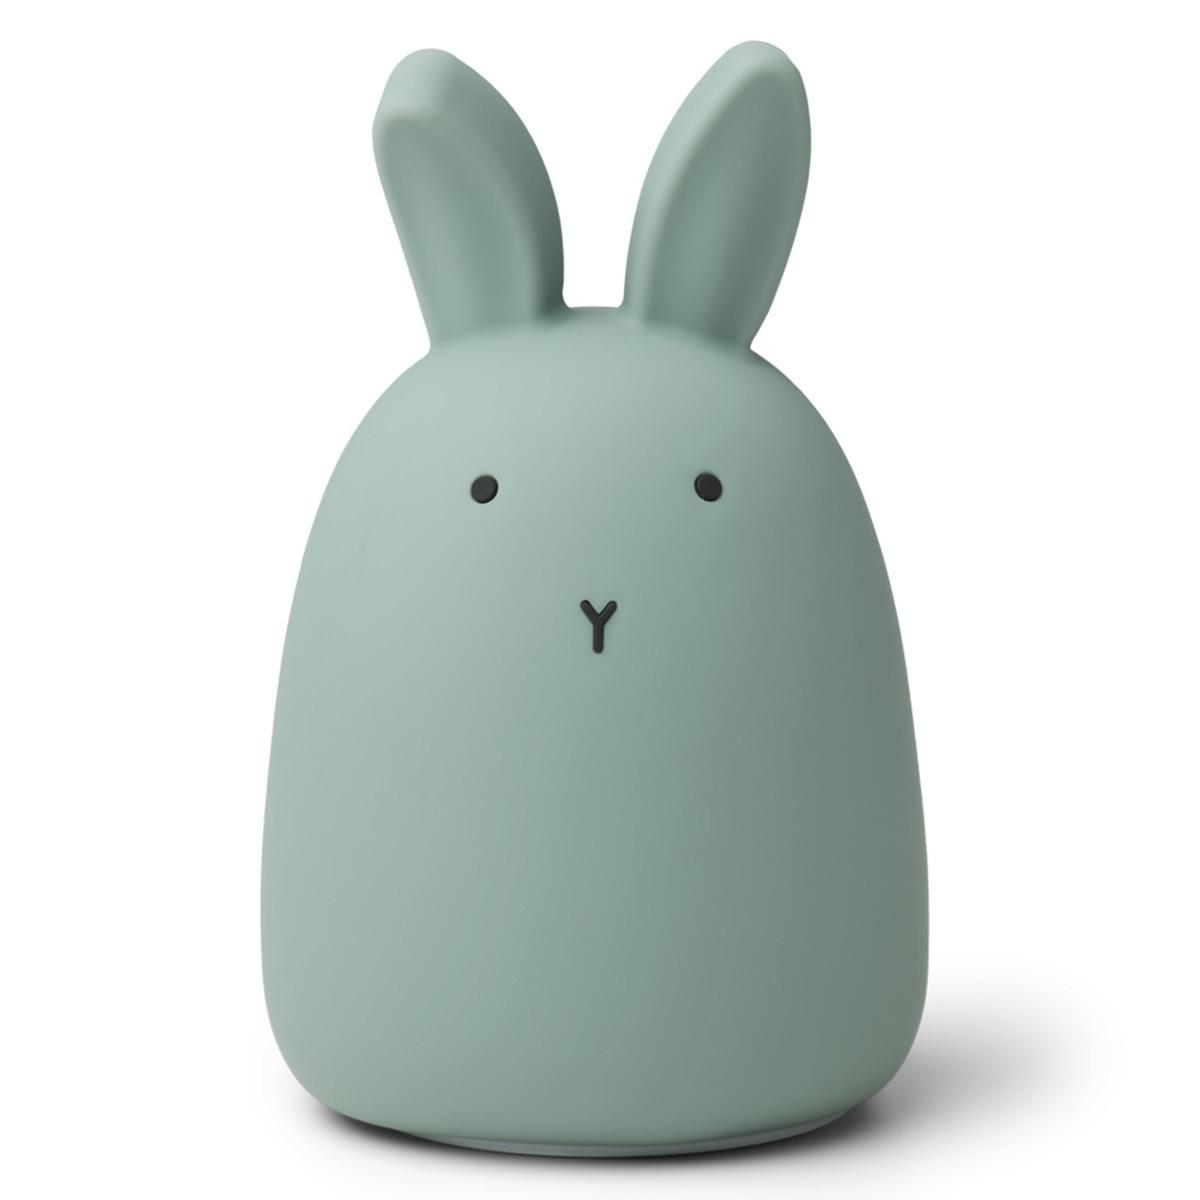 Veilleuse Veilleuse Winston - Rabbit Peppermint Veilleuse Winston - Rabbit Peppermint